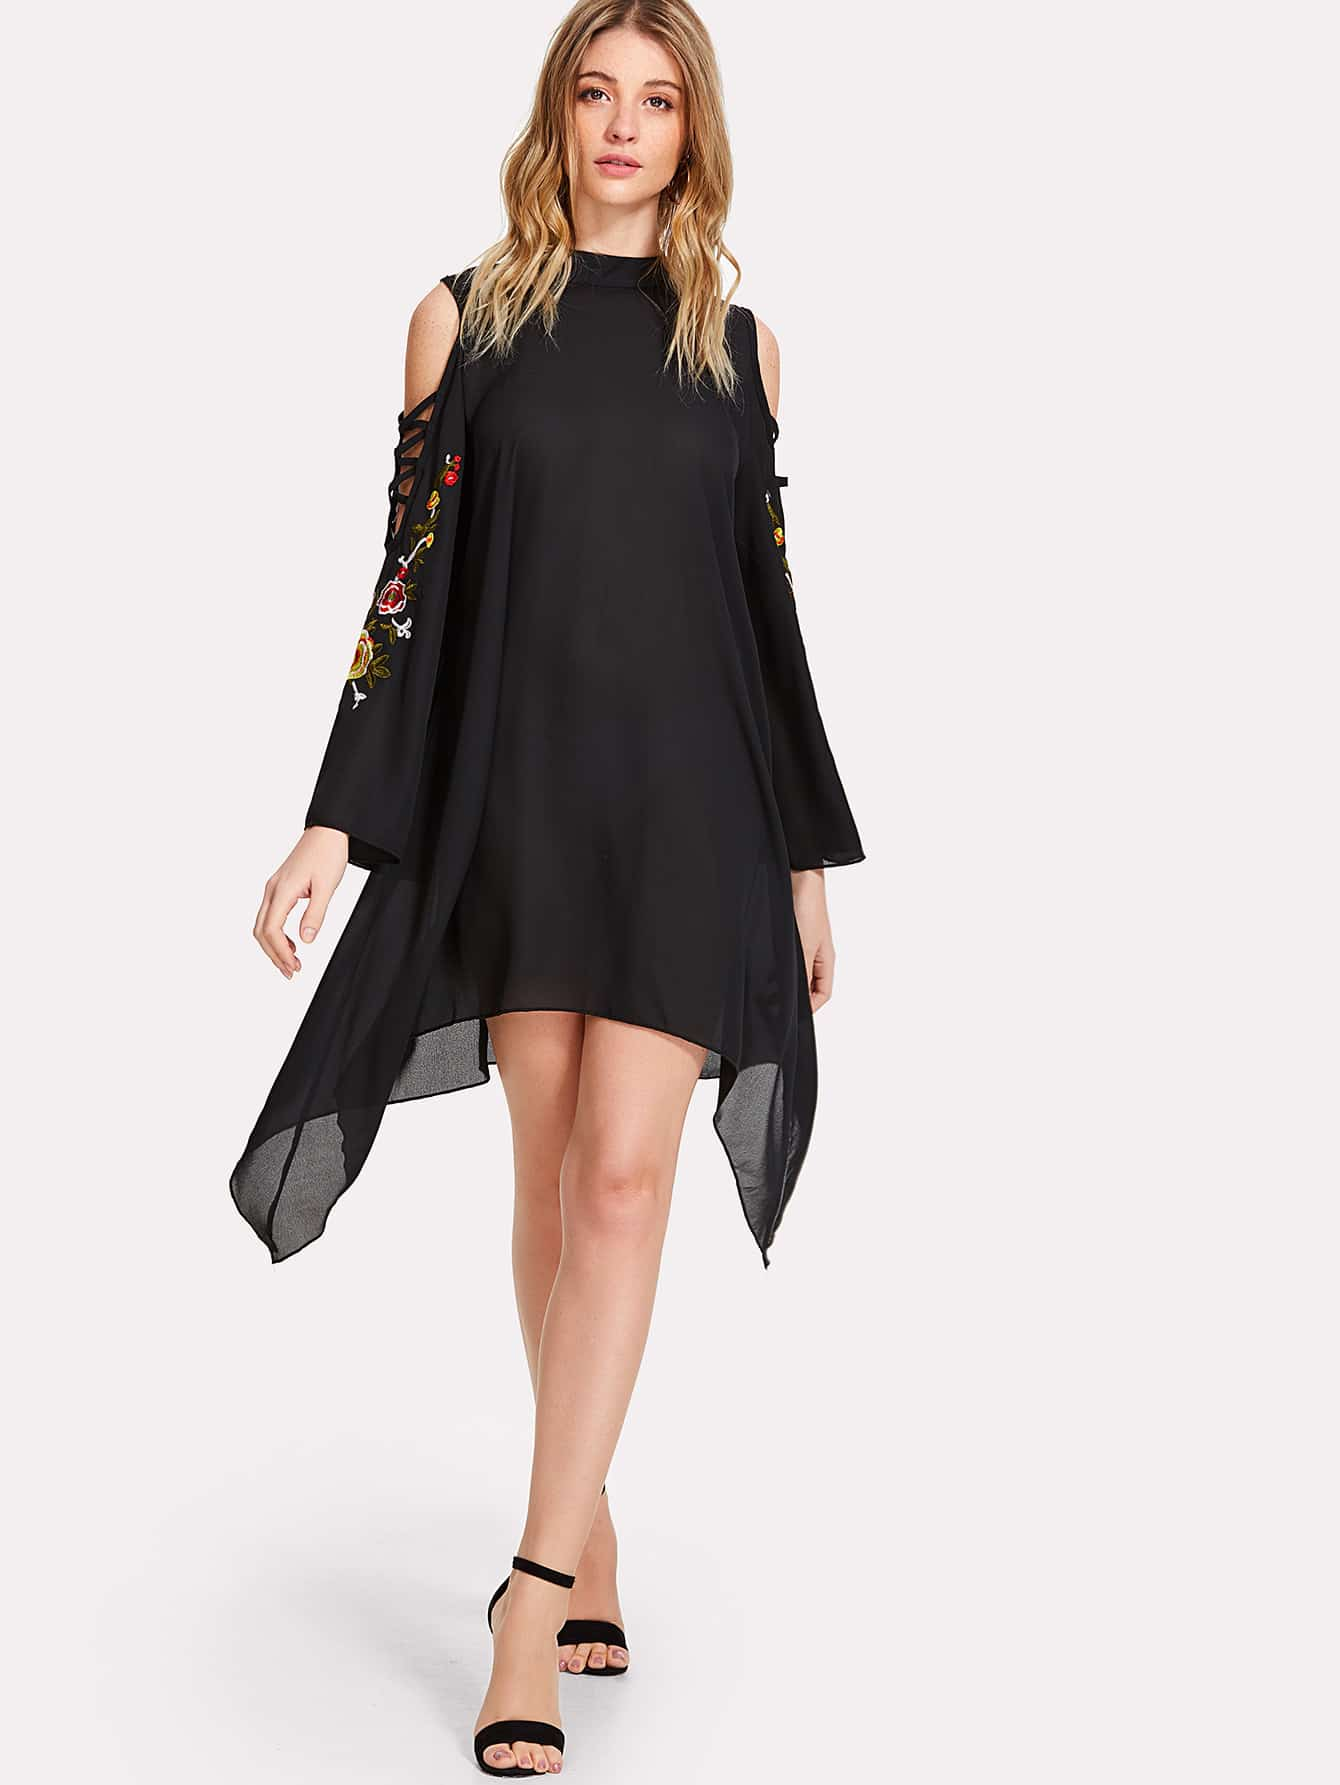 Crisscross Embroidered Sleeve Hanky Hem Swing Dress high slit hanky hem metallic halter dress